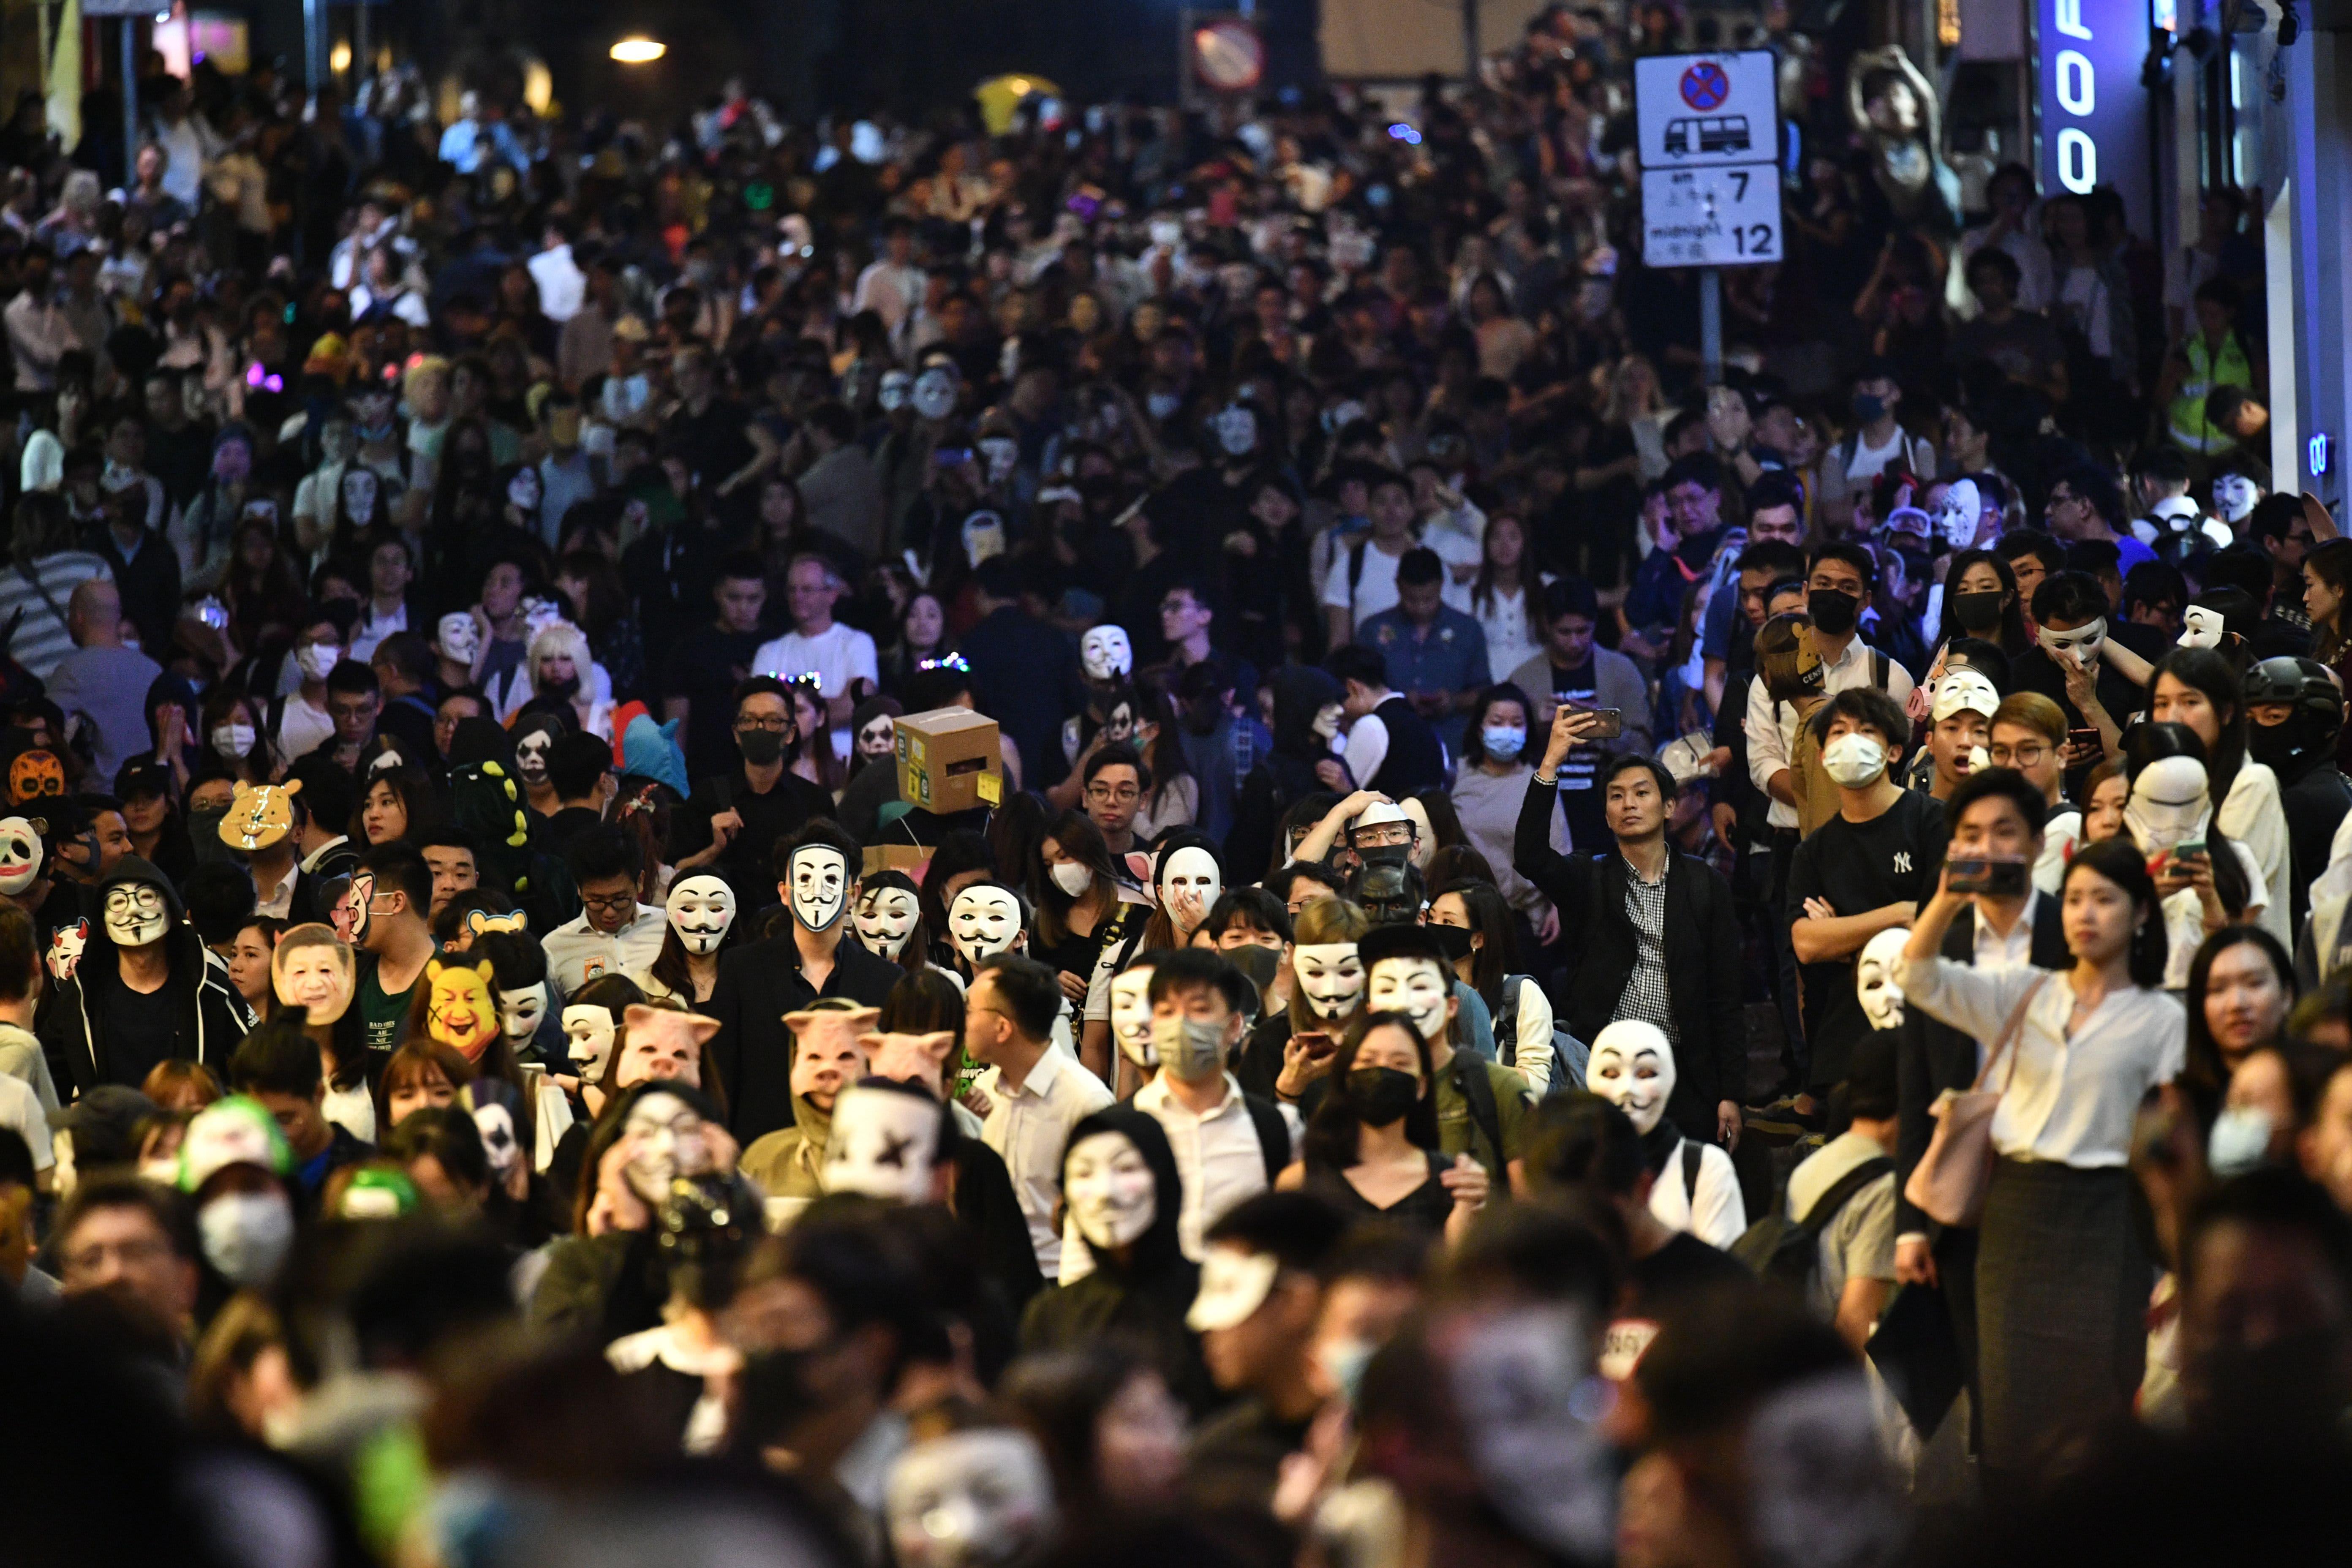 Hong Kong just entered a recession. Experts say economy will 'remain weak' amid protests, trade war